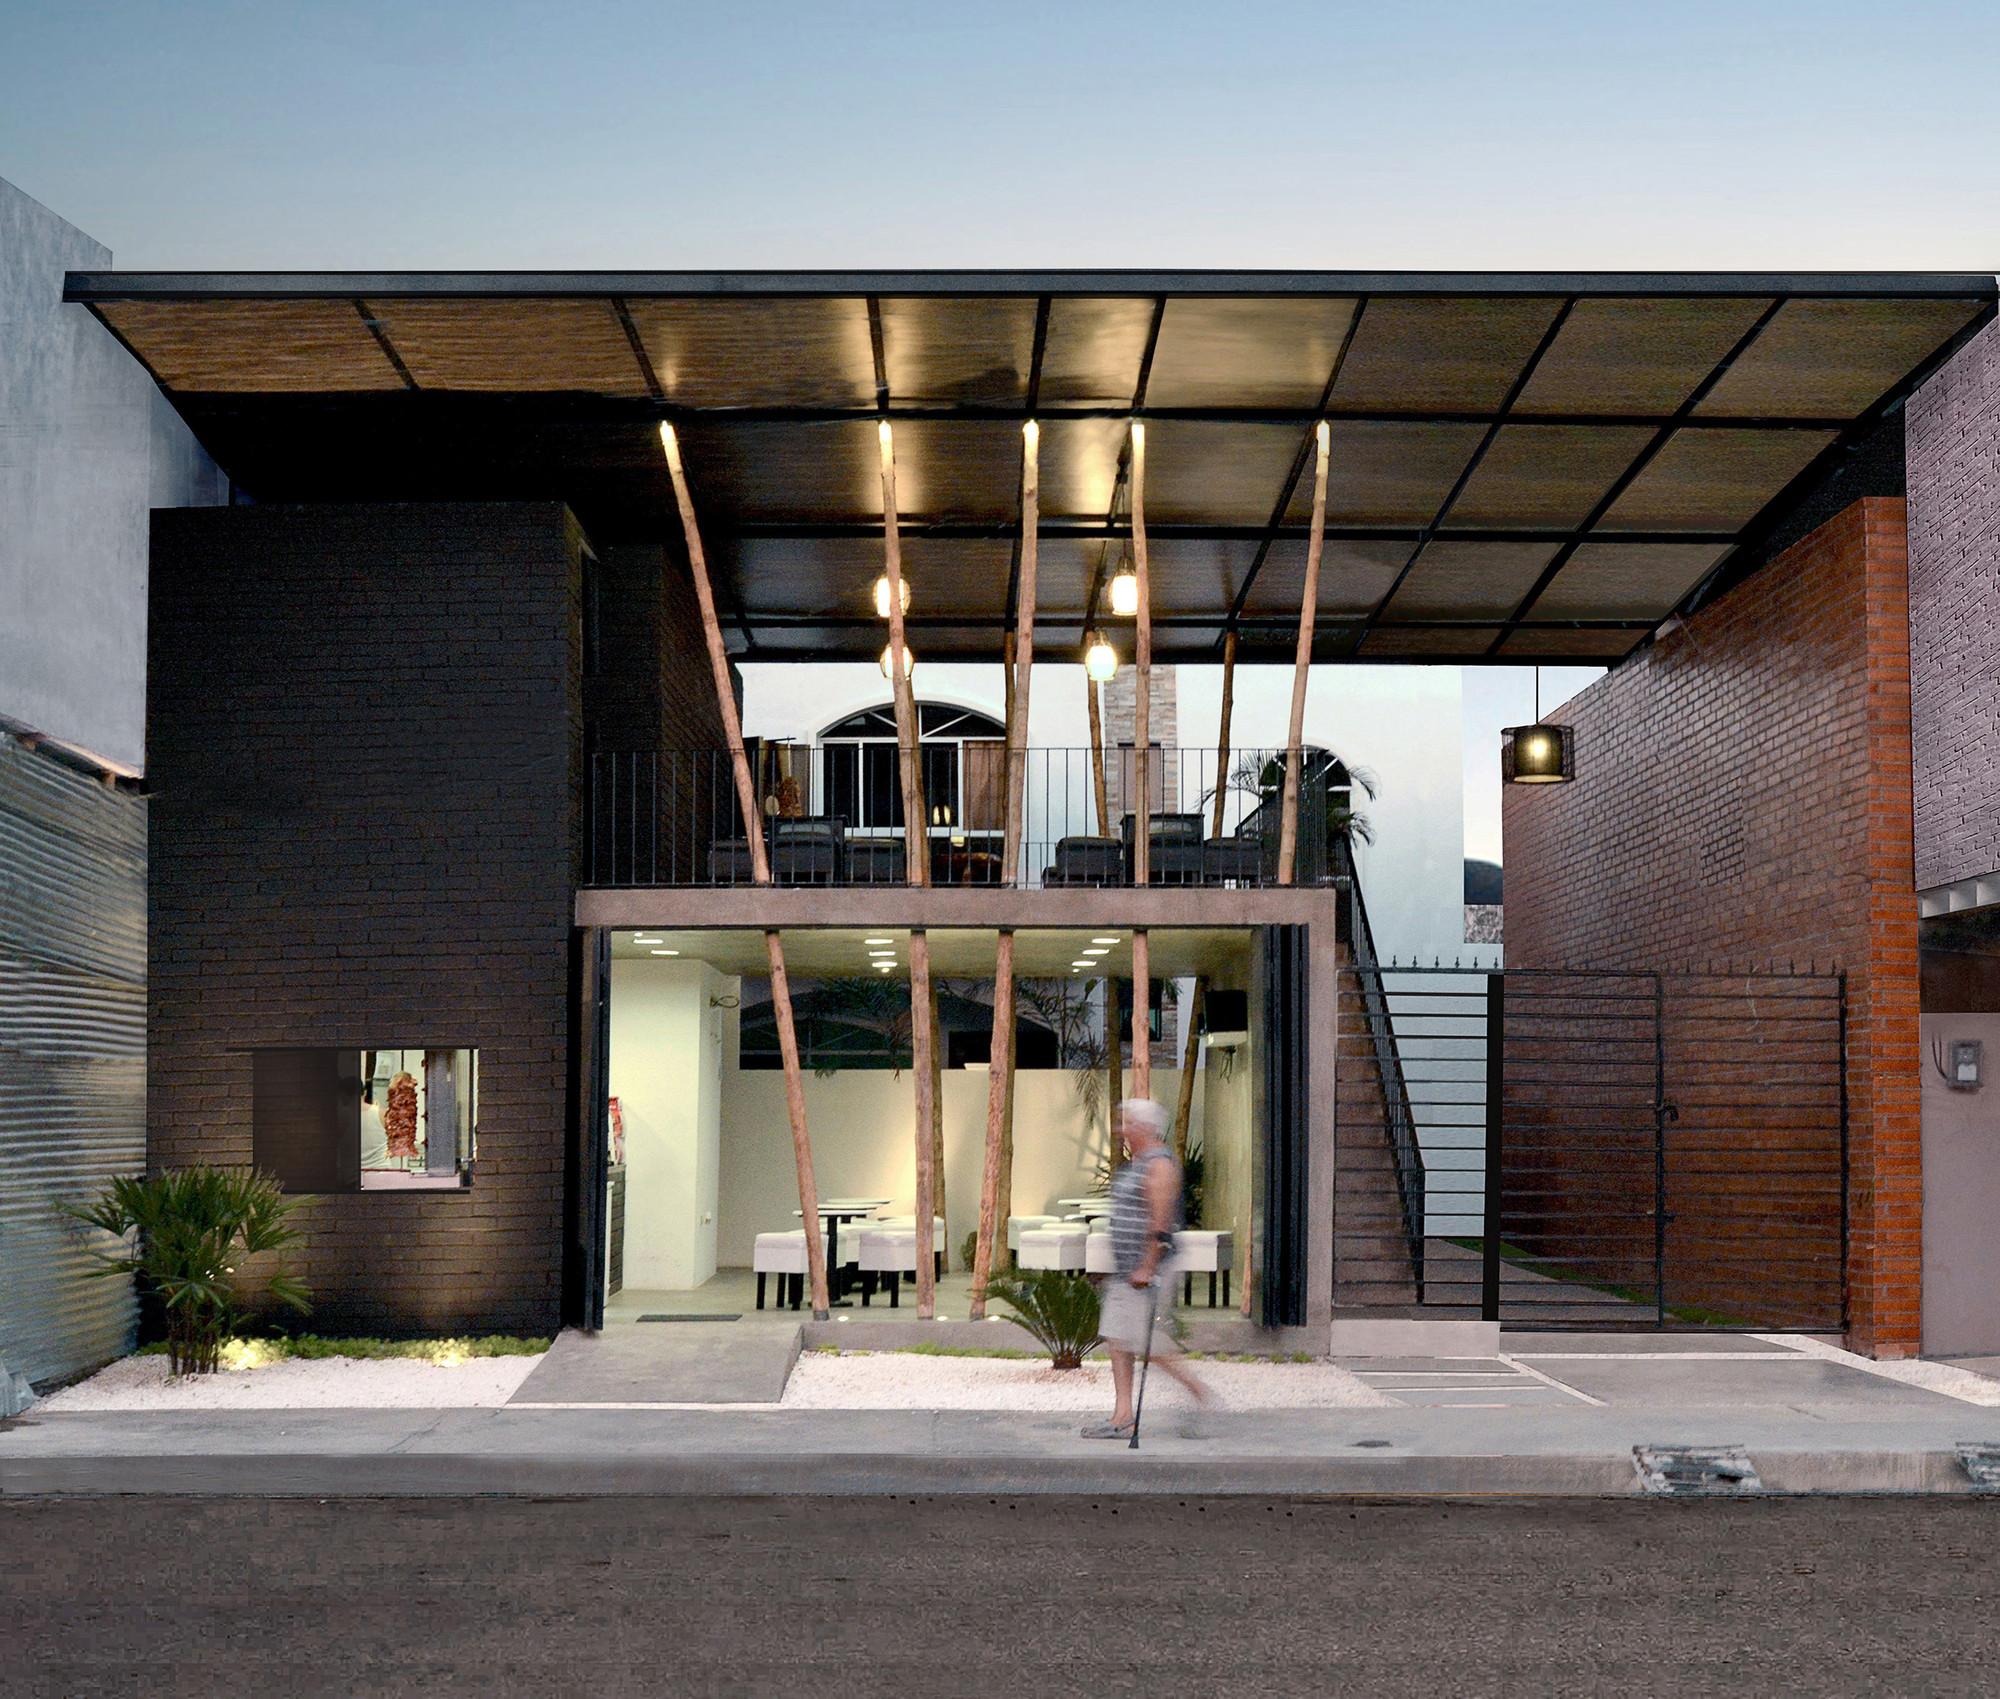 Restaurante Don Shawarma / Natura Futura Arquitectura